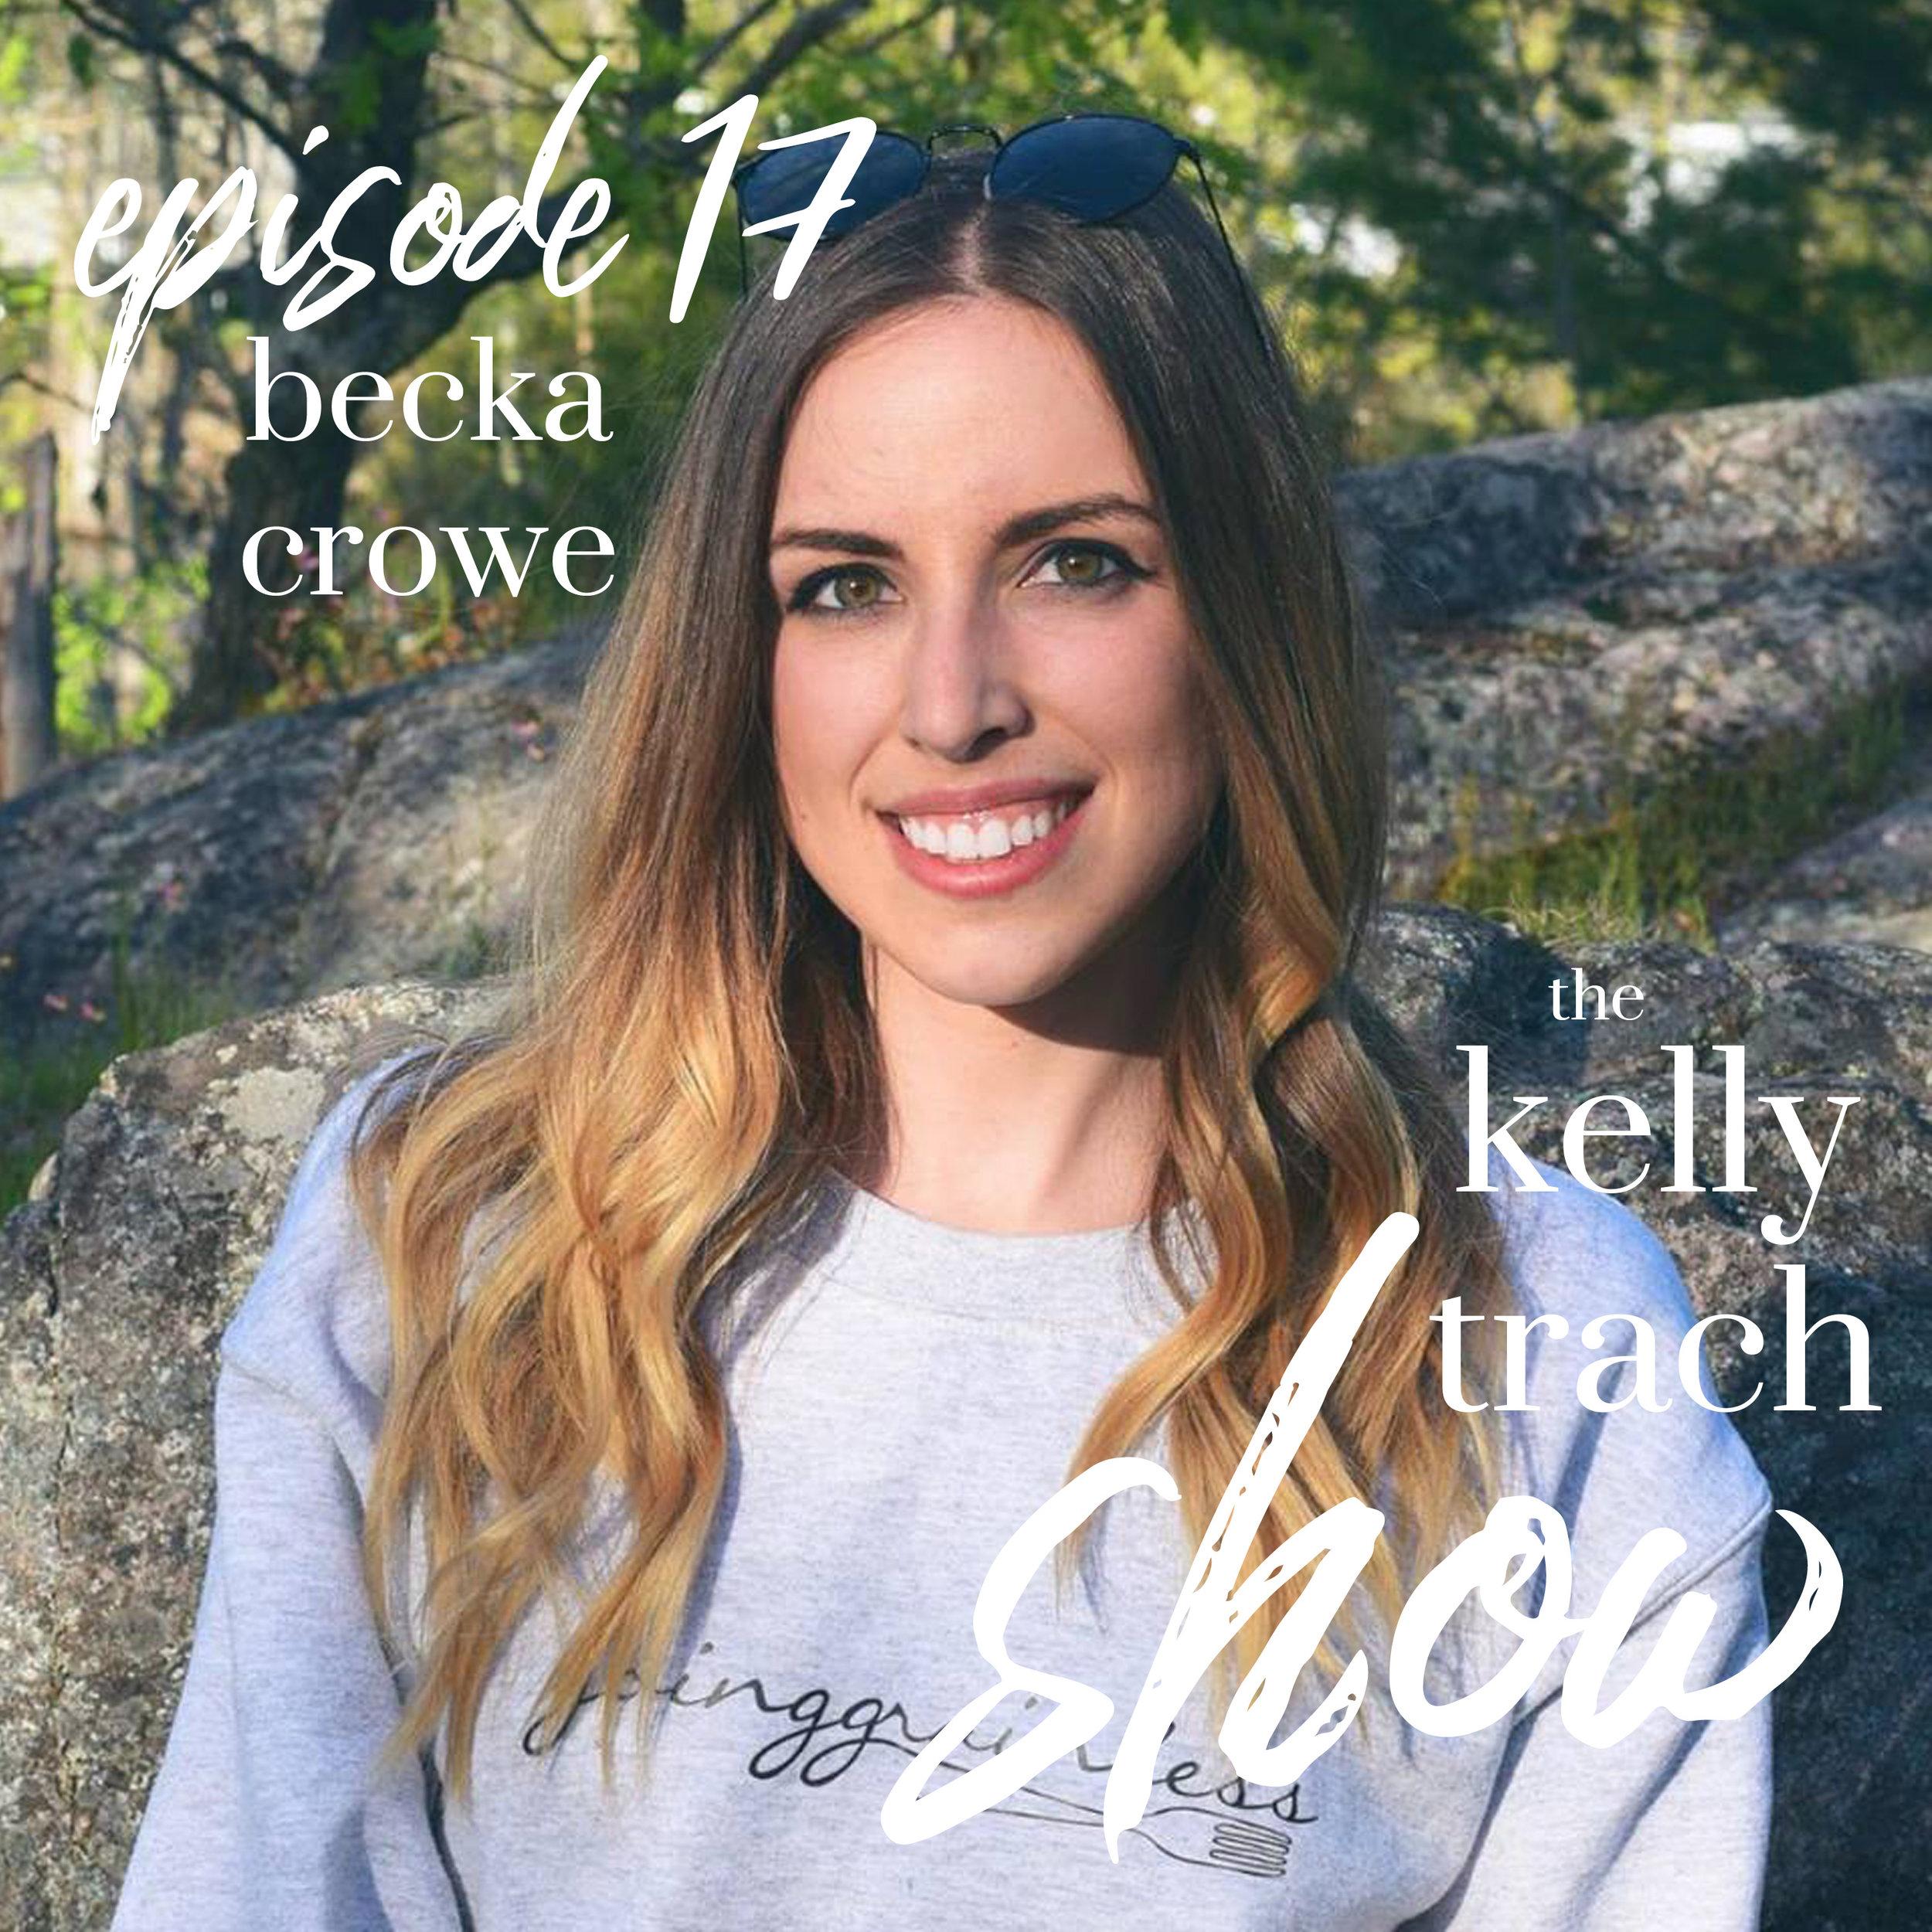 17 - Becka Crowe -  The Kelly Trach Show.jpg